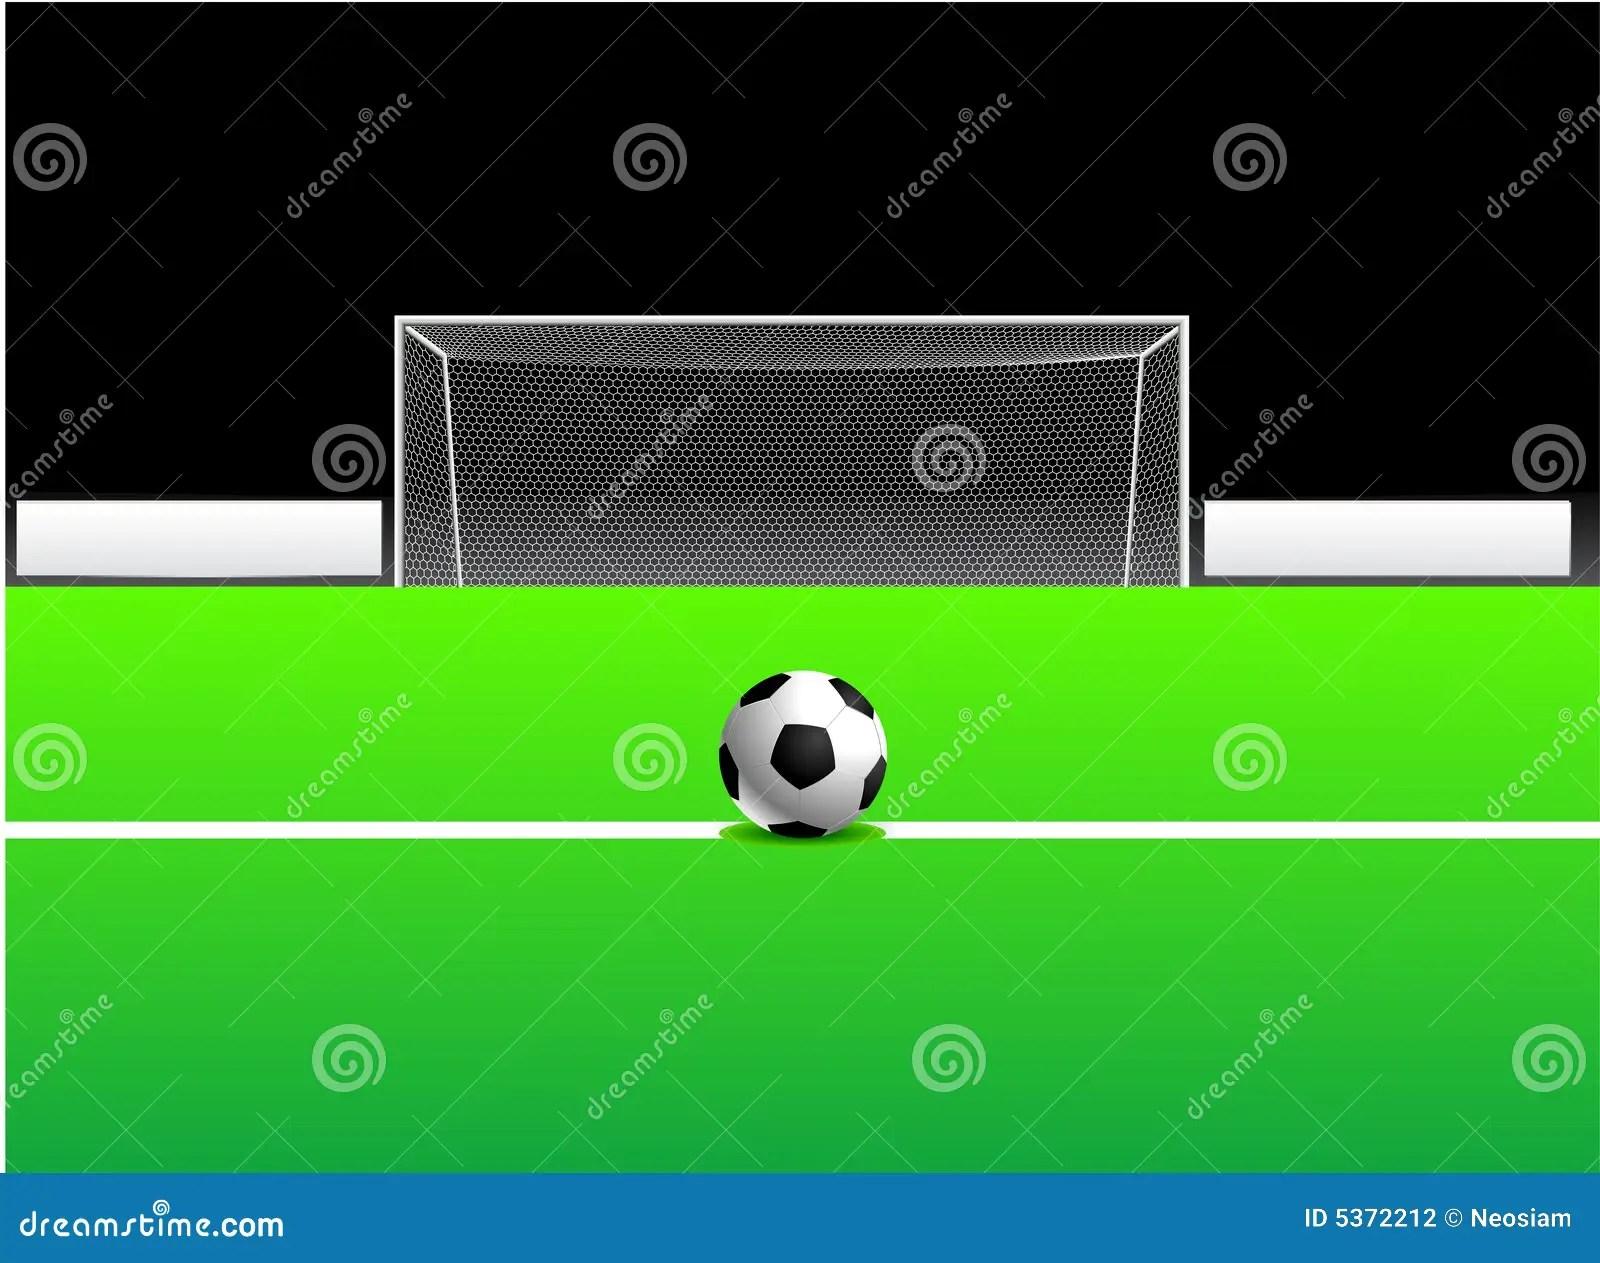 Soccer Football Ball And Goal Stock Vector